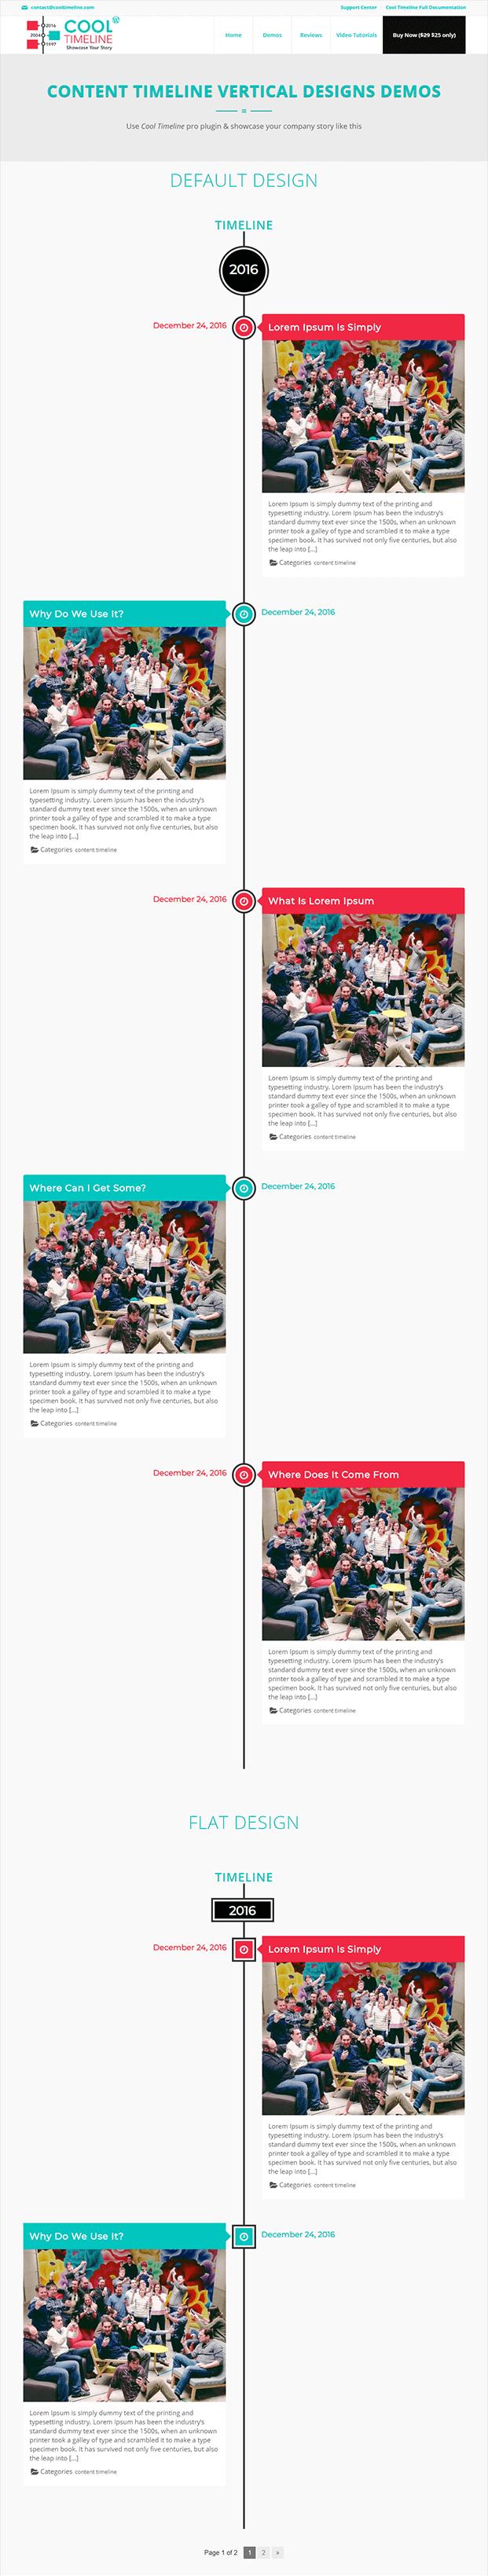 Cool Timeline Pro WordPress Plugin - Vertical Format